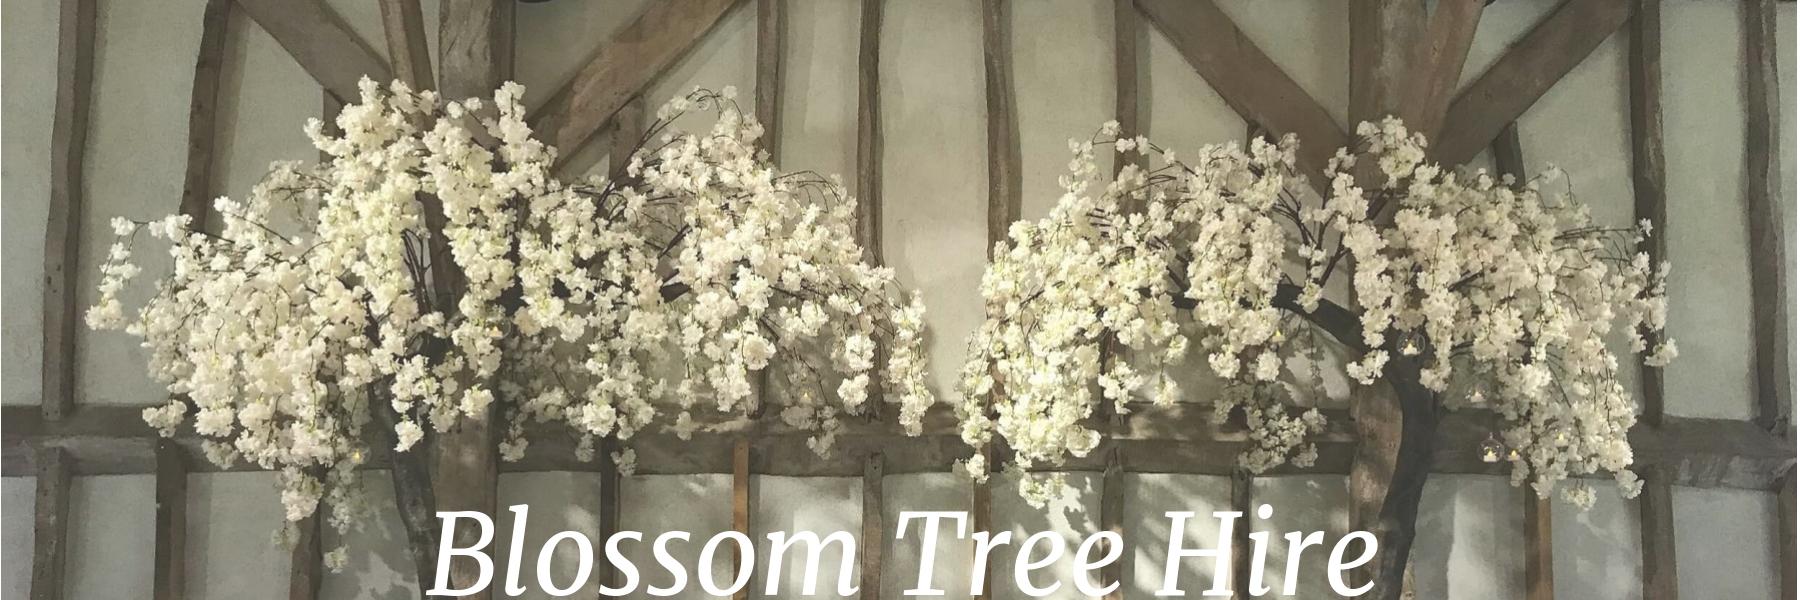 Blossom Tree Hire.jpg